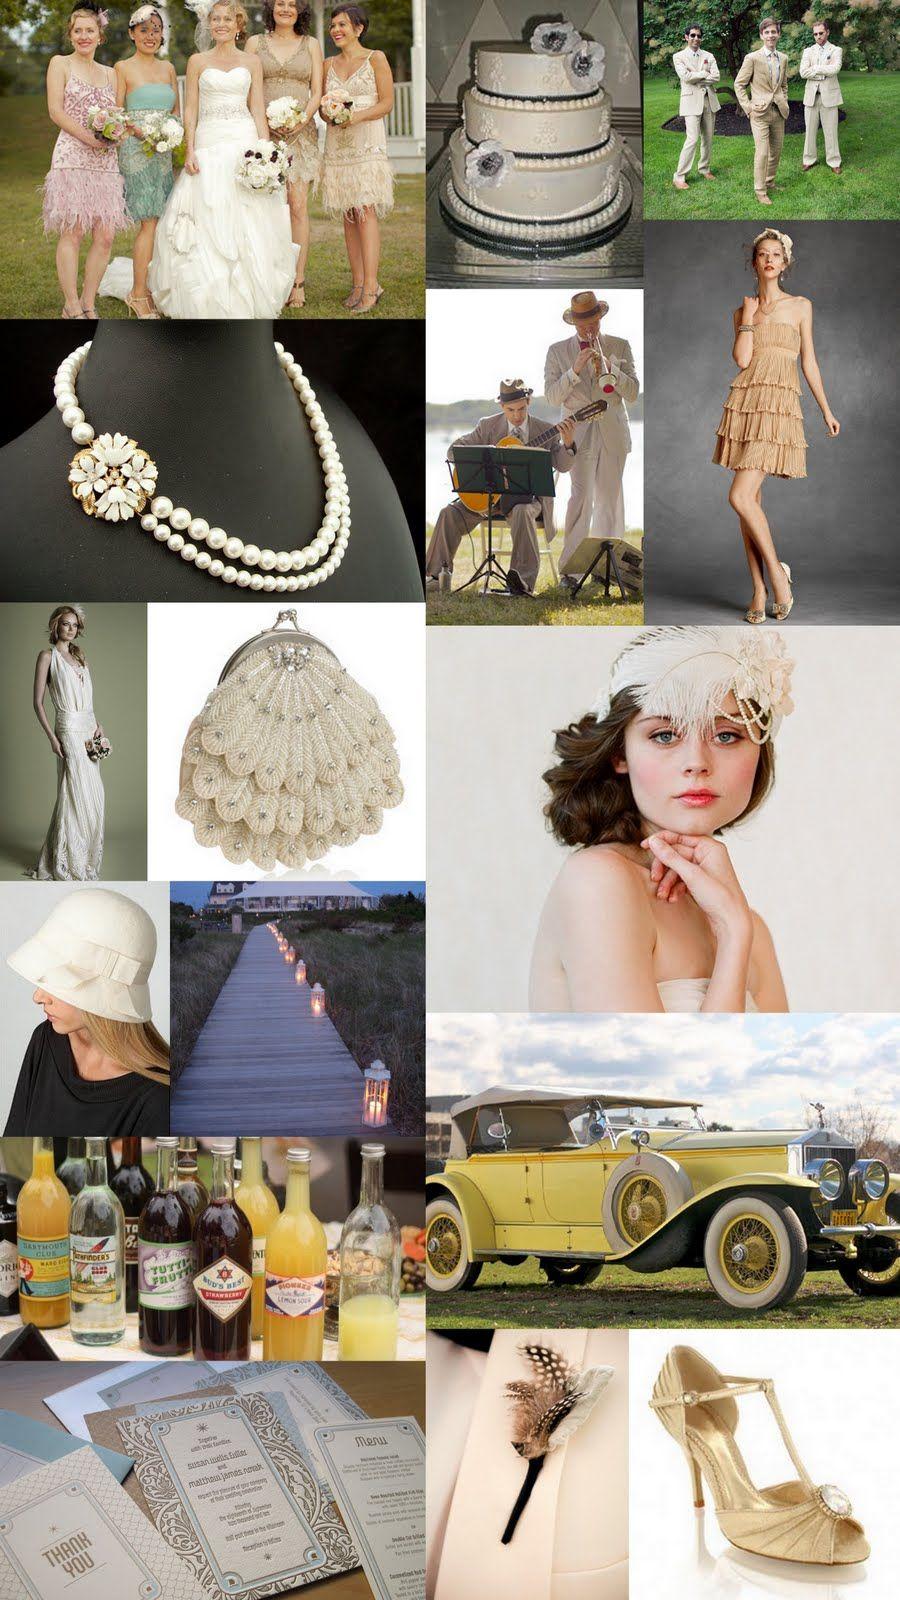 1920s wedding decoration ideas  GREAT GATSBY WEDDING THEMES  paperdollromancespot  uS